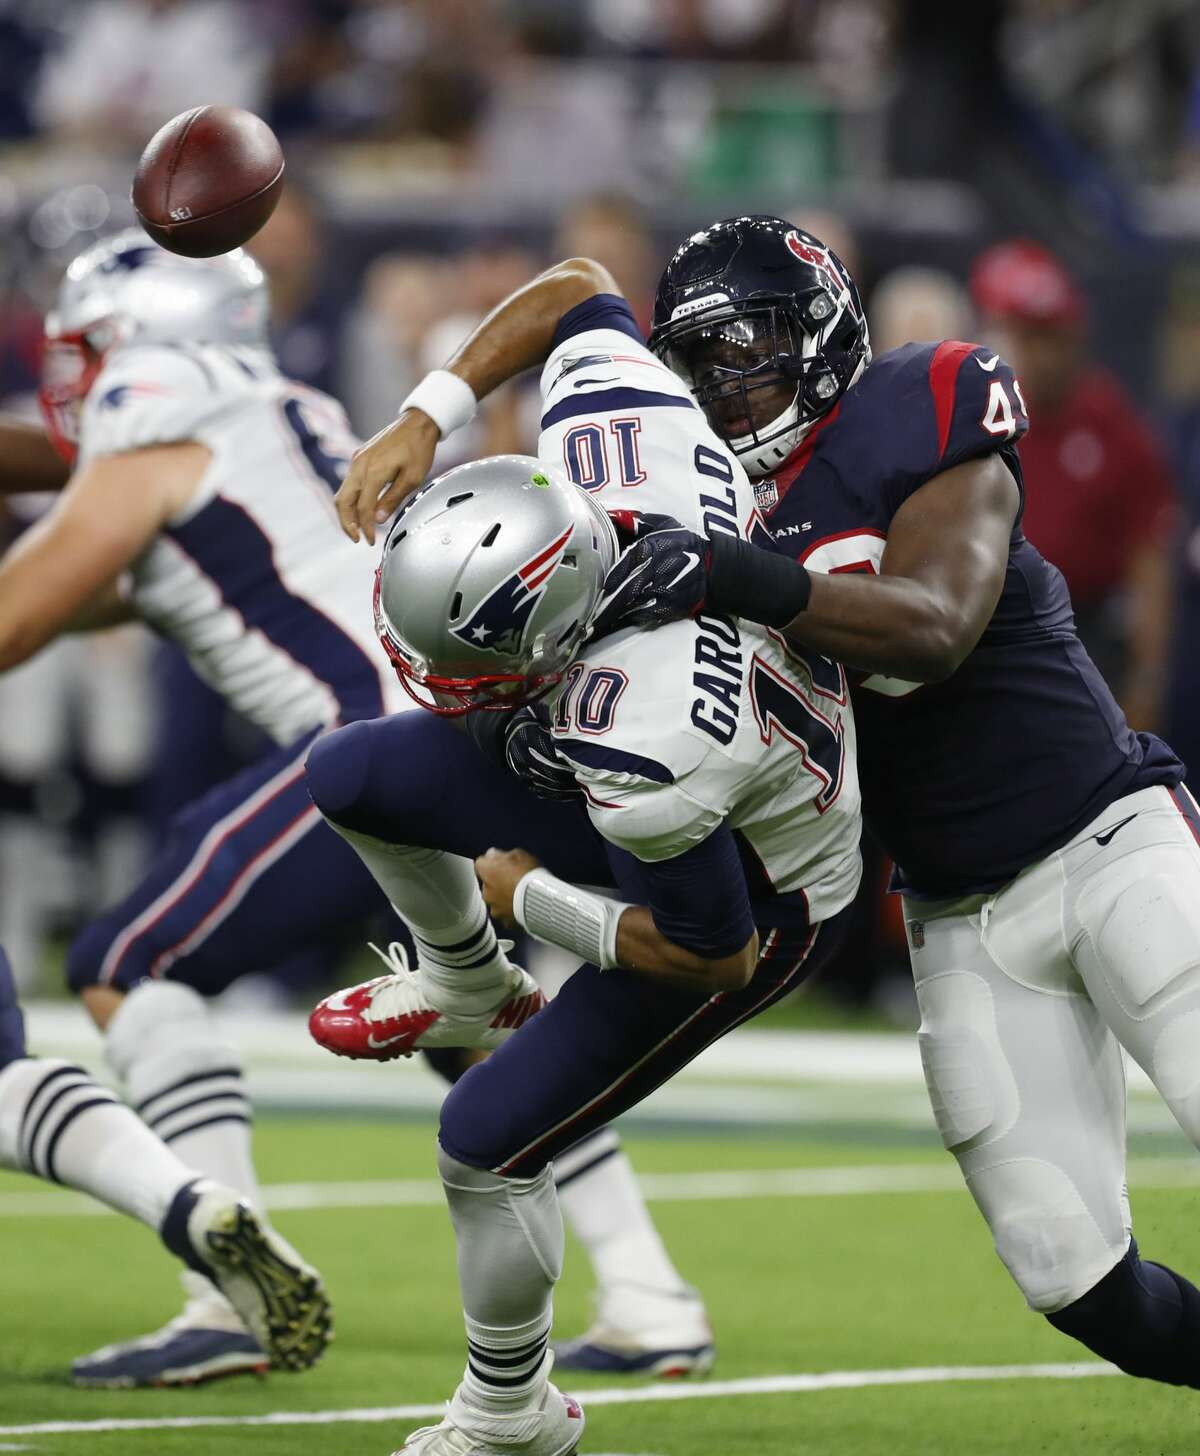 Houston Texans outside linebacker Tony Washington (49) sacks New England Patriots quarterback Jimmy Garoppolo (10) causing him to fumble the ball during the third quarter of an NFL pre-season football game at NRG Stadium on Saturday, Aug. 19, 2017, in Houston. ( Brett Coomer / Houston Chronicle )